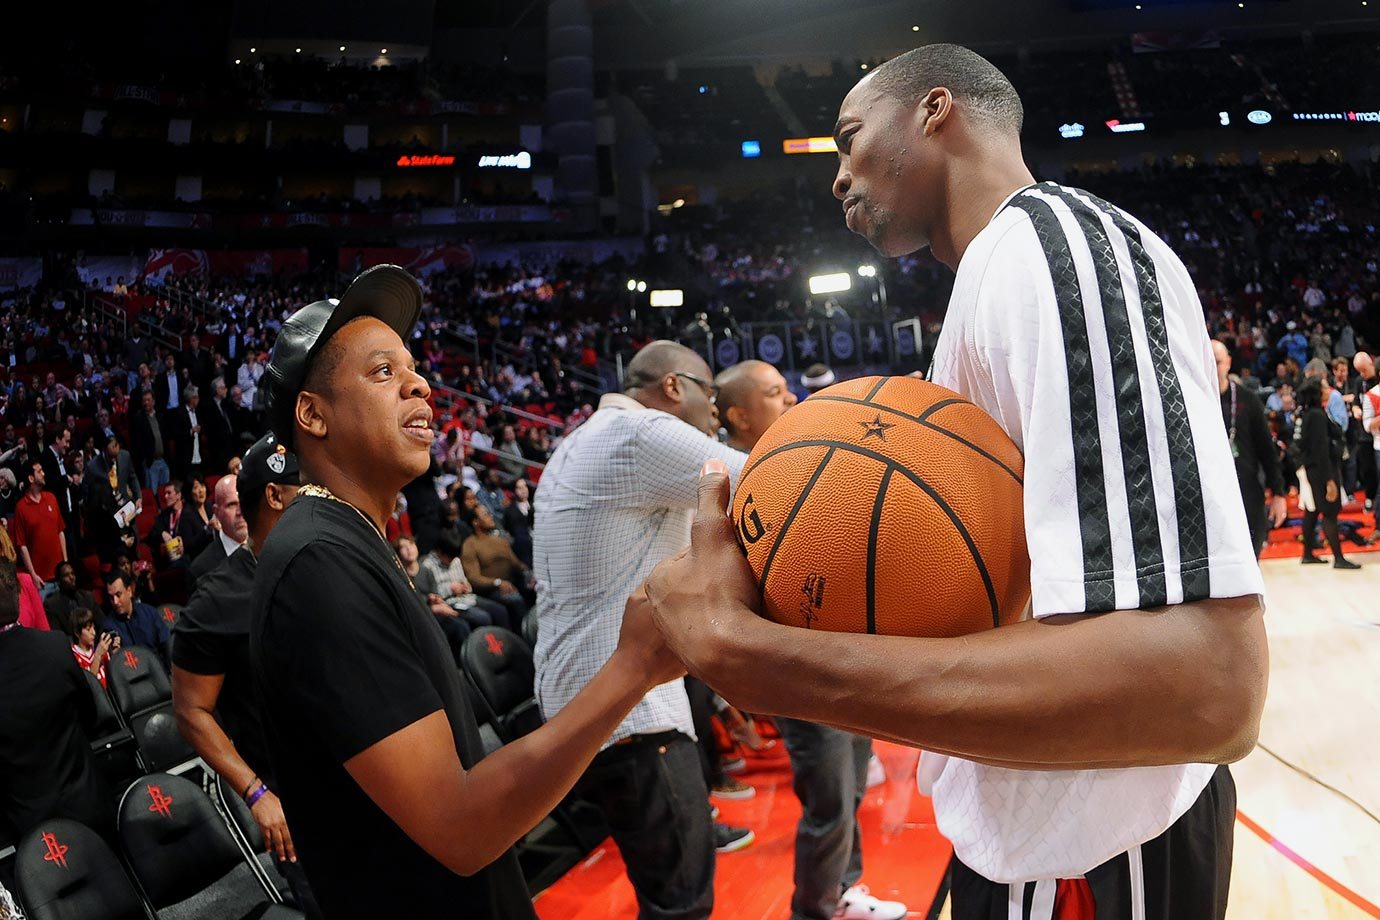 Feb. 17, 2013 — NBA All-Star Game